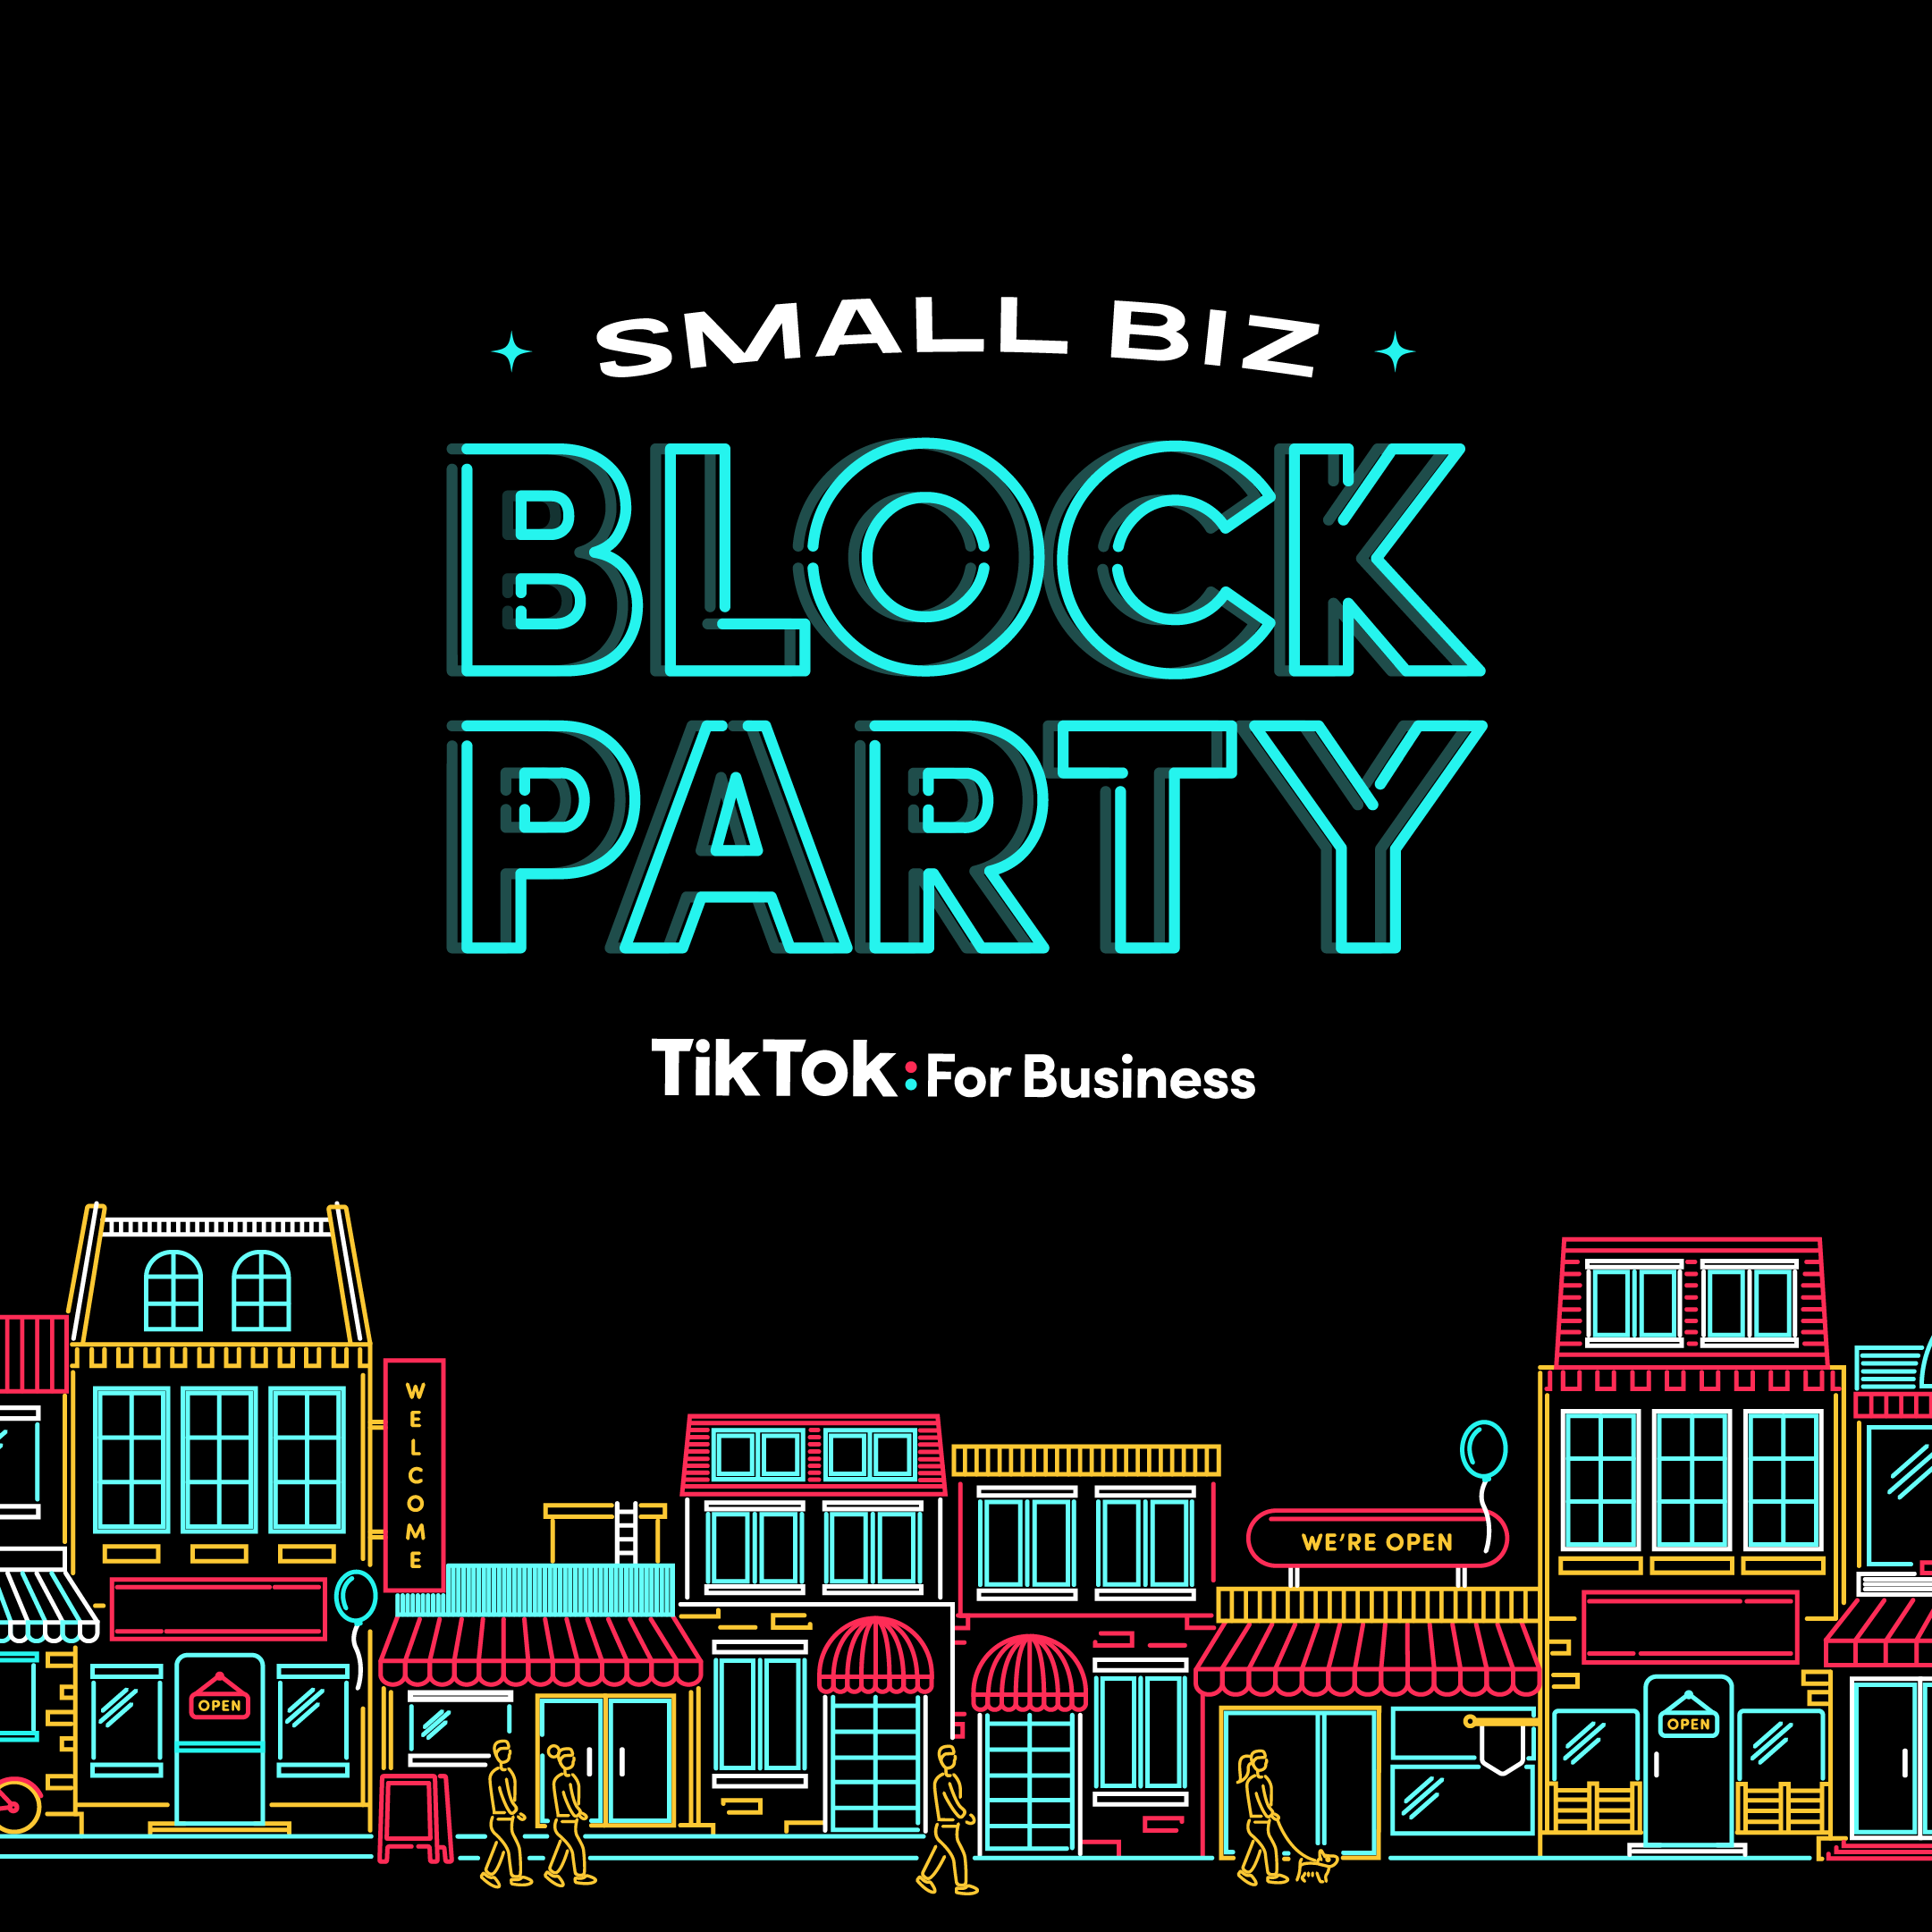 TikTok Small Biz Block Party